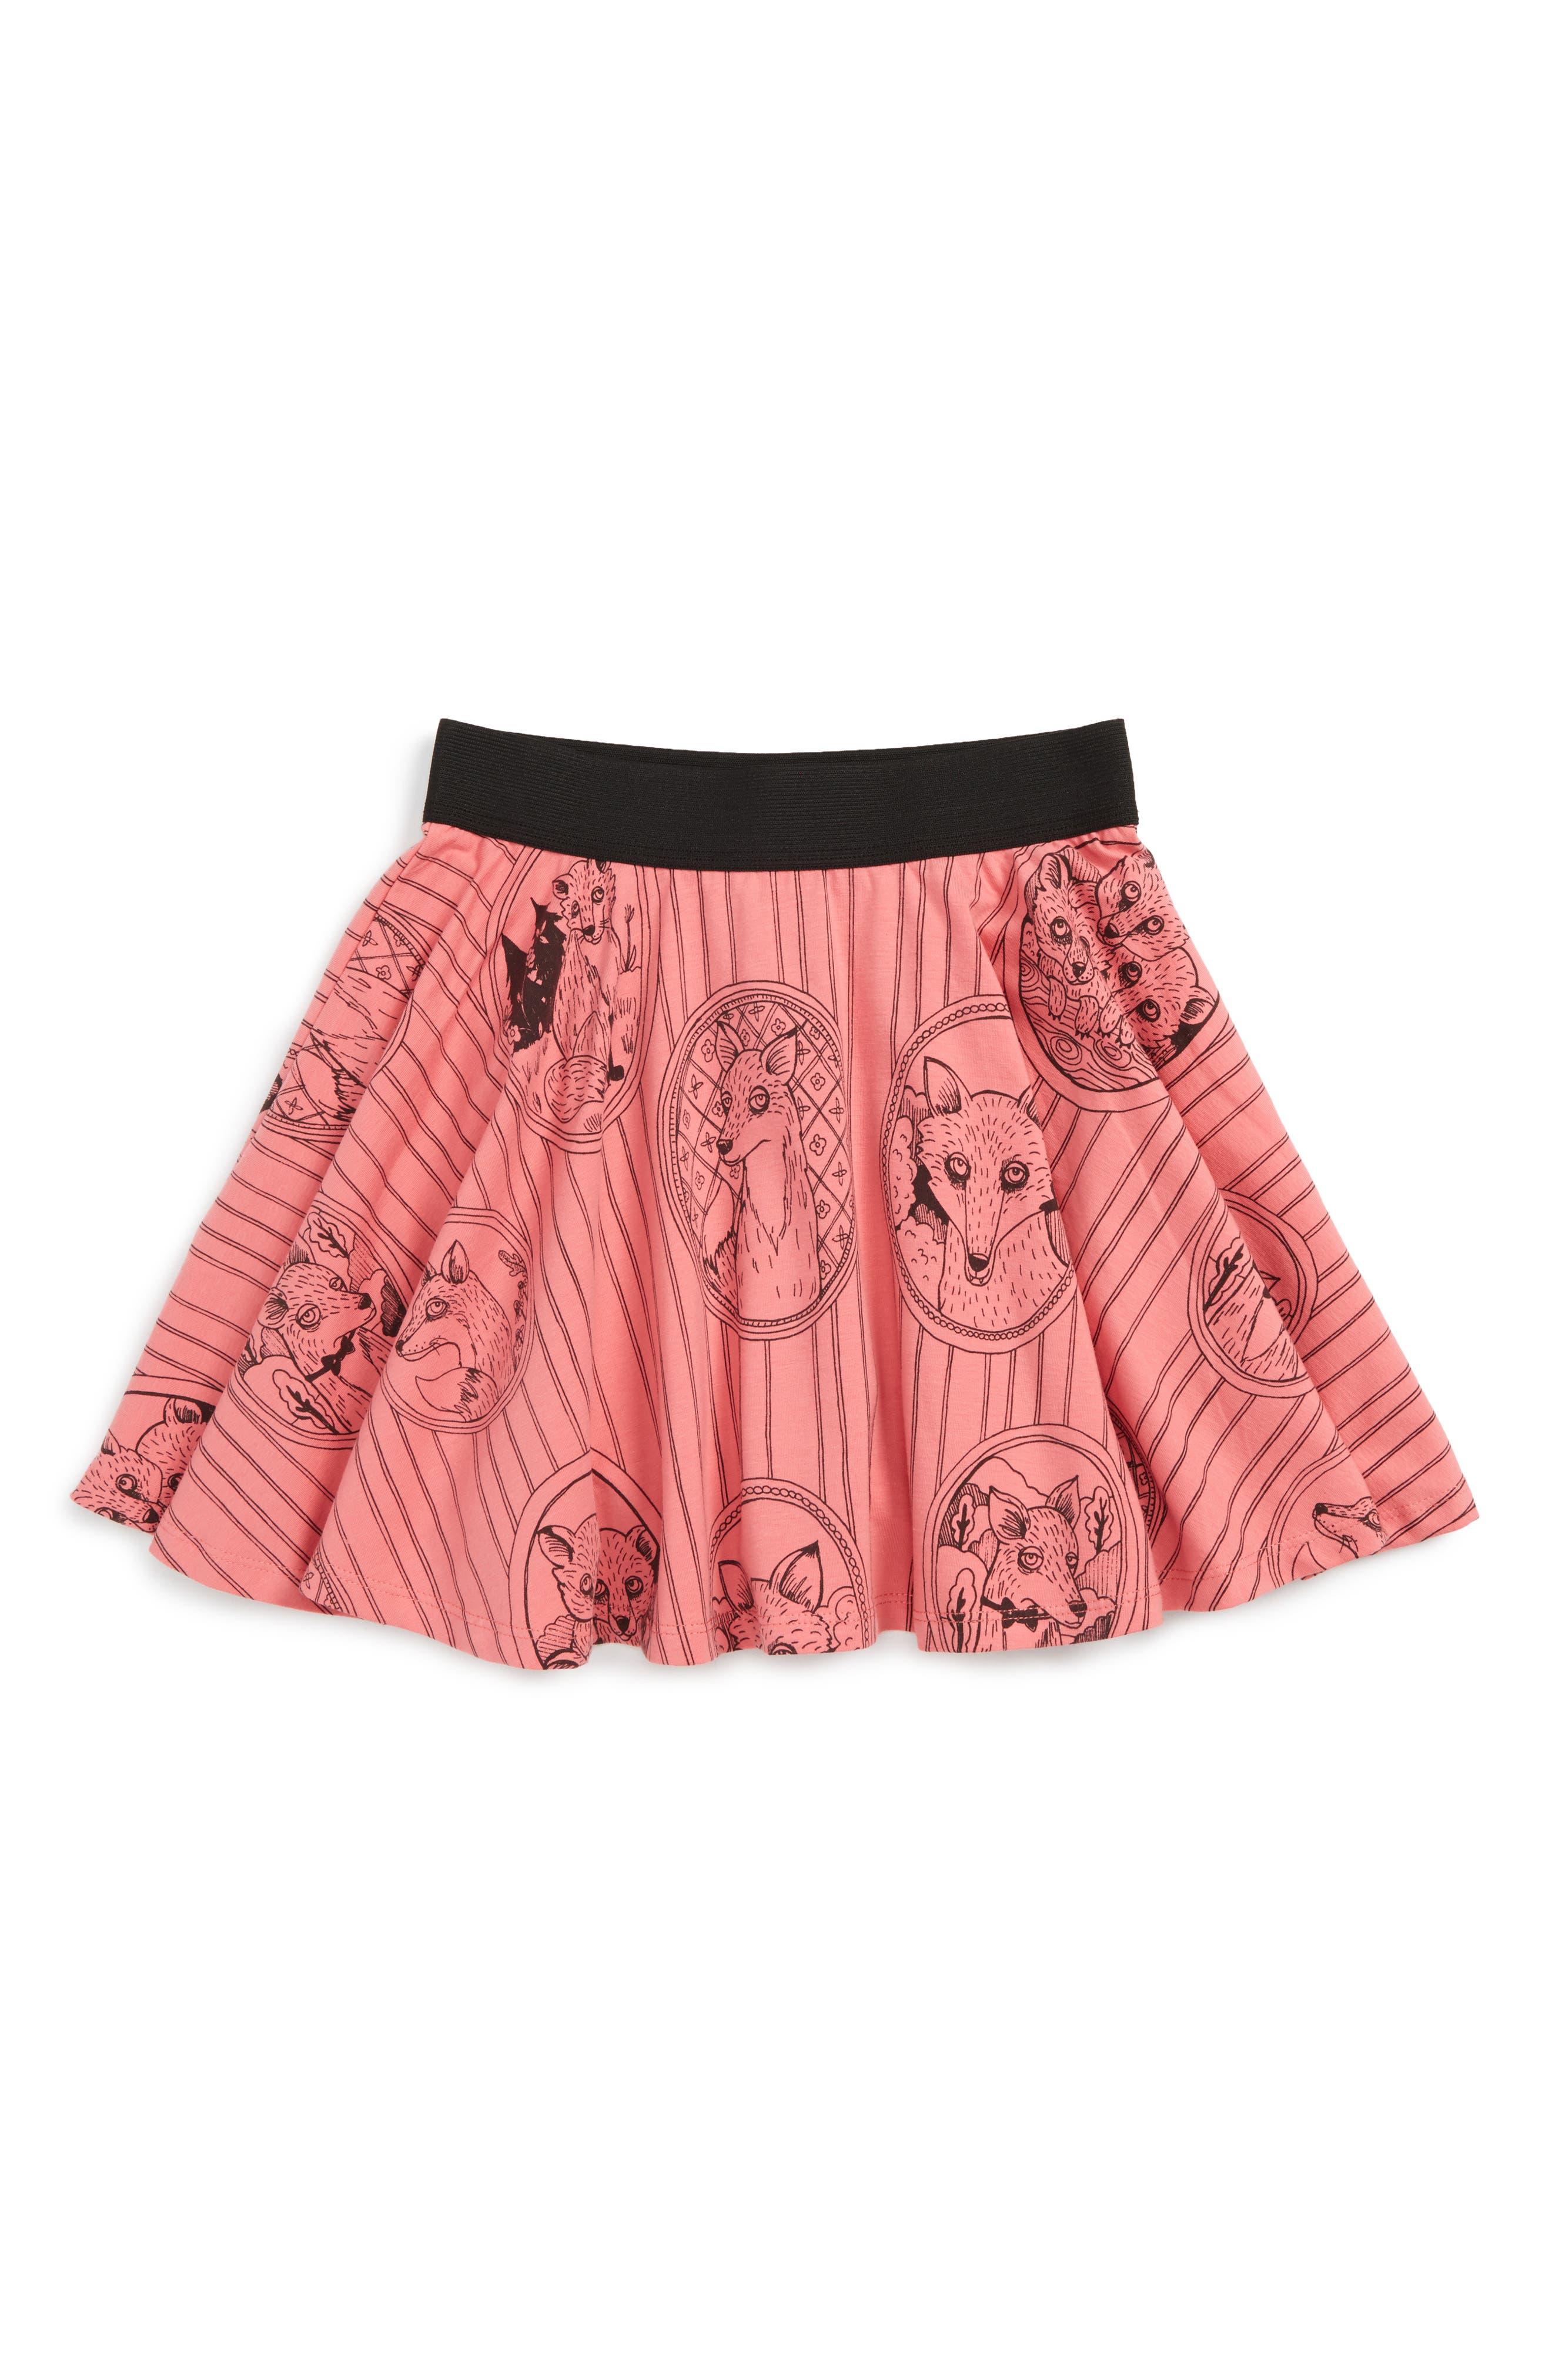 Fox Family Skirt,                             Main thumbnail 1, color,                             Pink